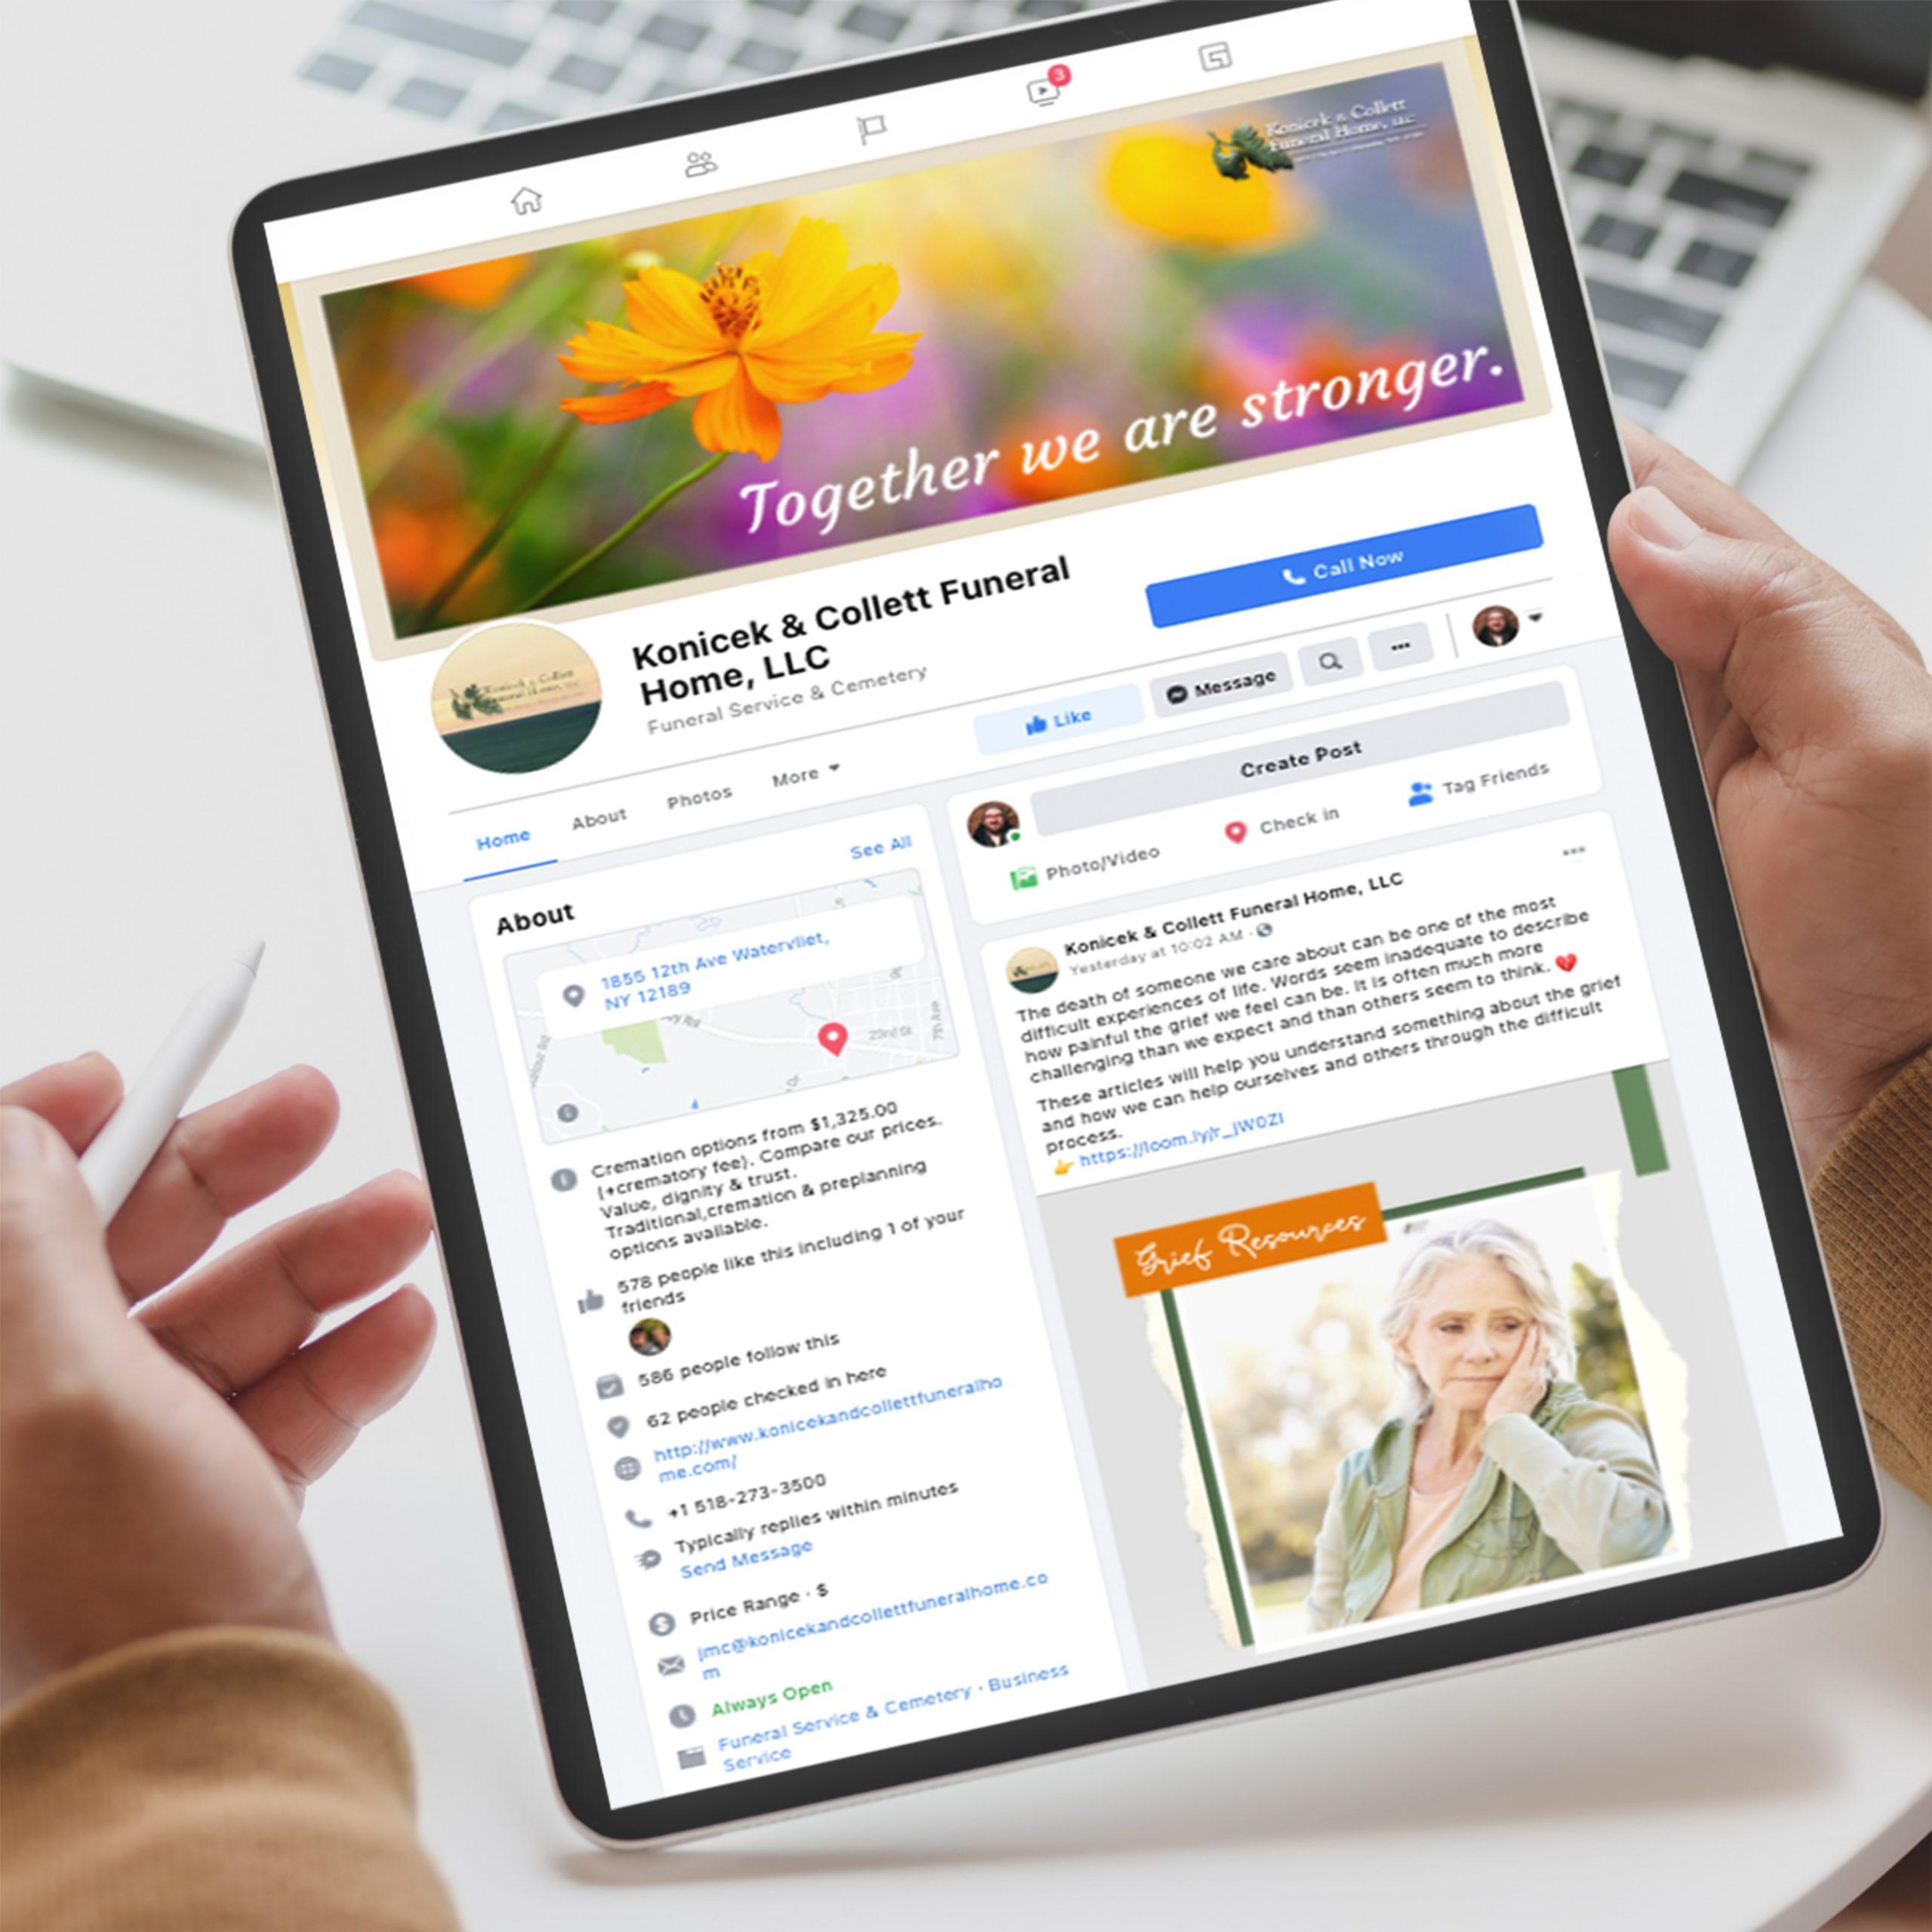 Konicek & Collett Funeral Home - Facebook Marketing